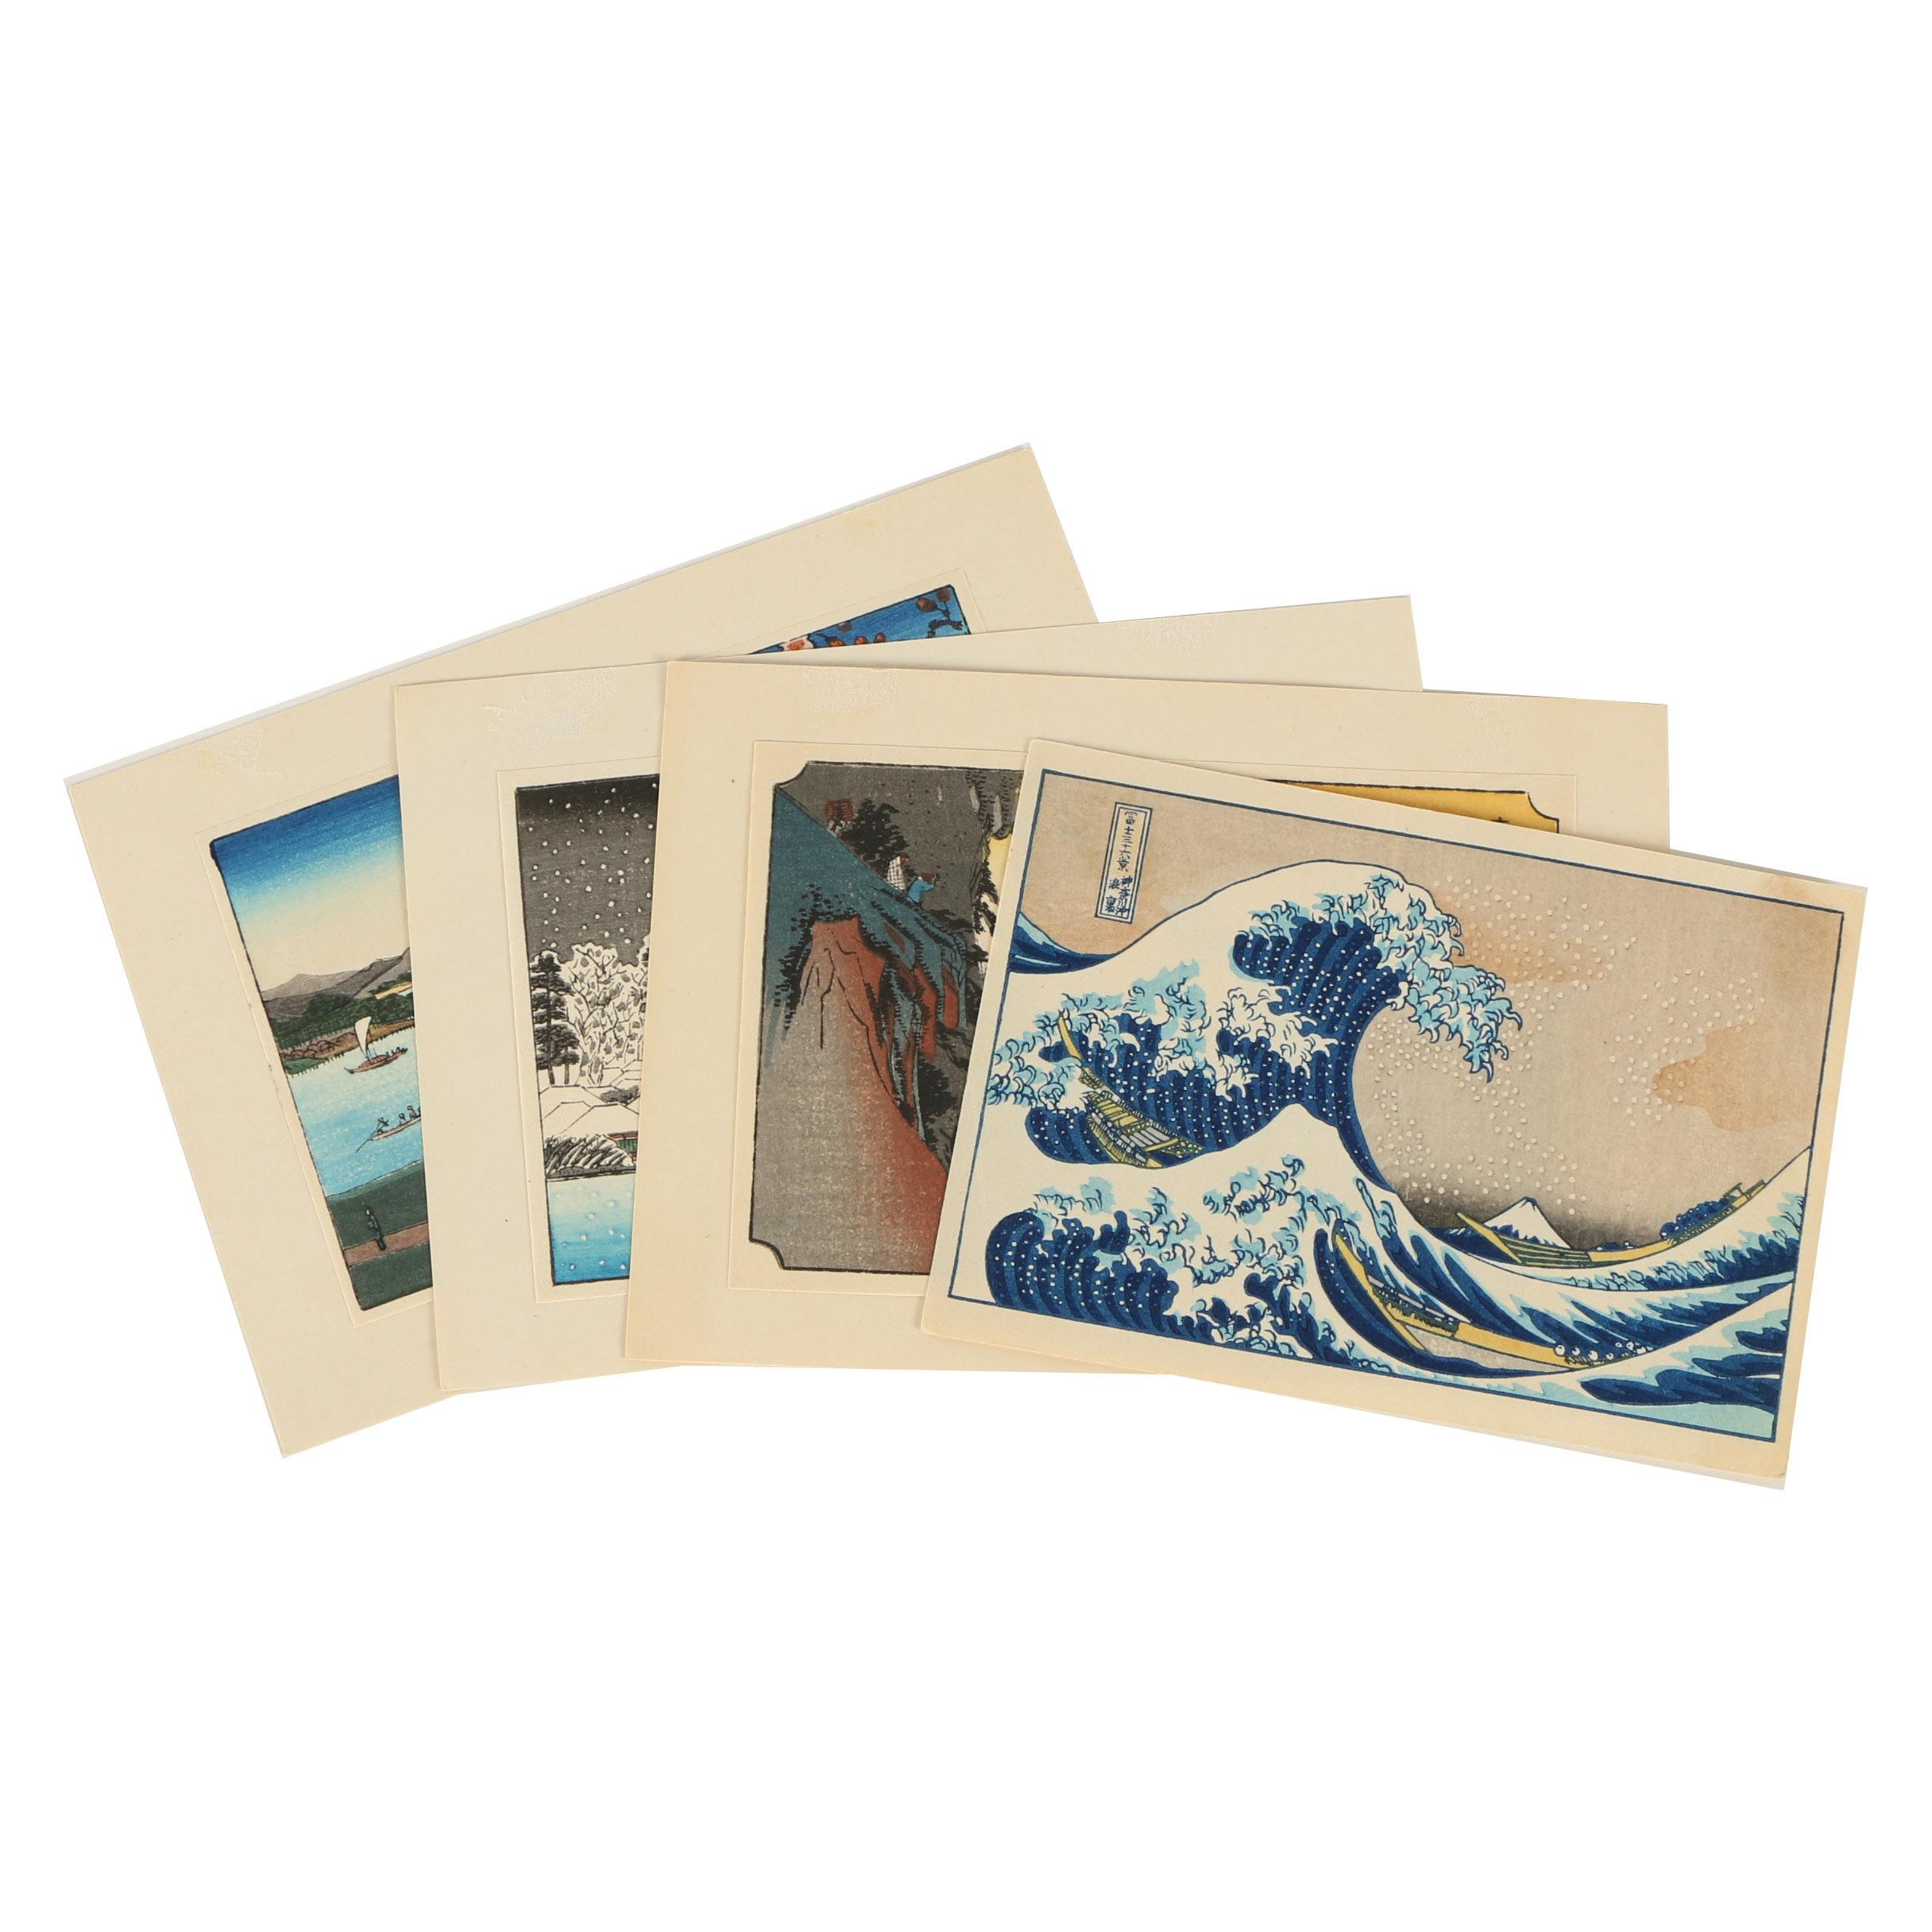 20th Century Reproduction Woodblock Prints